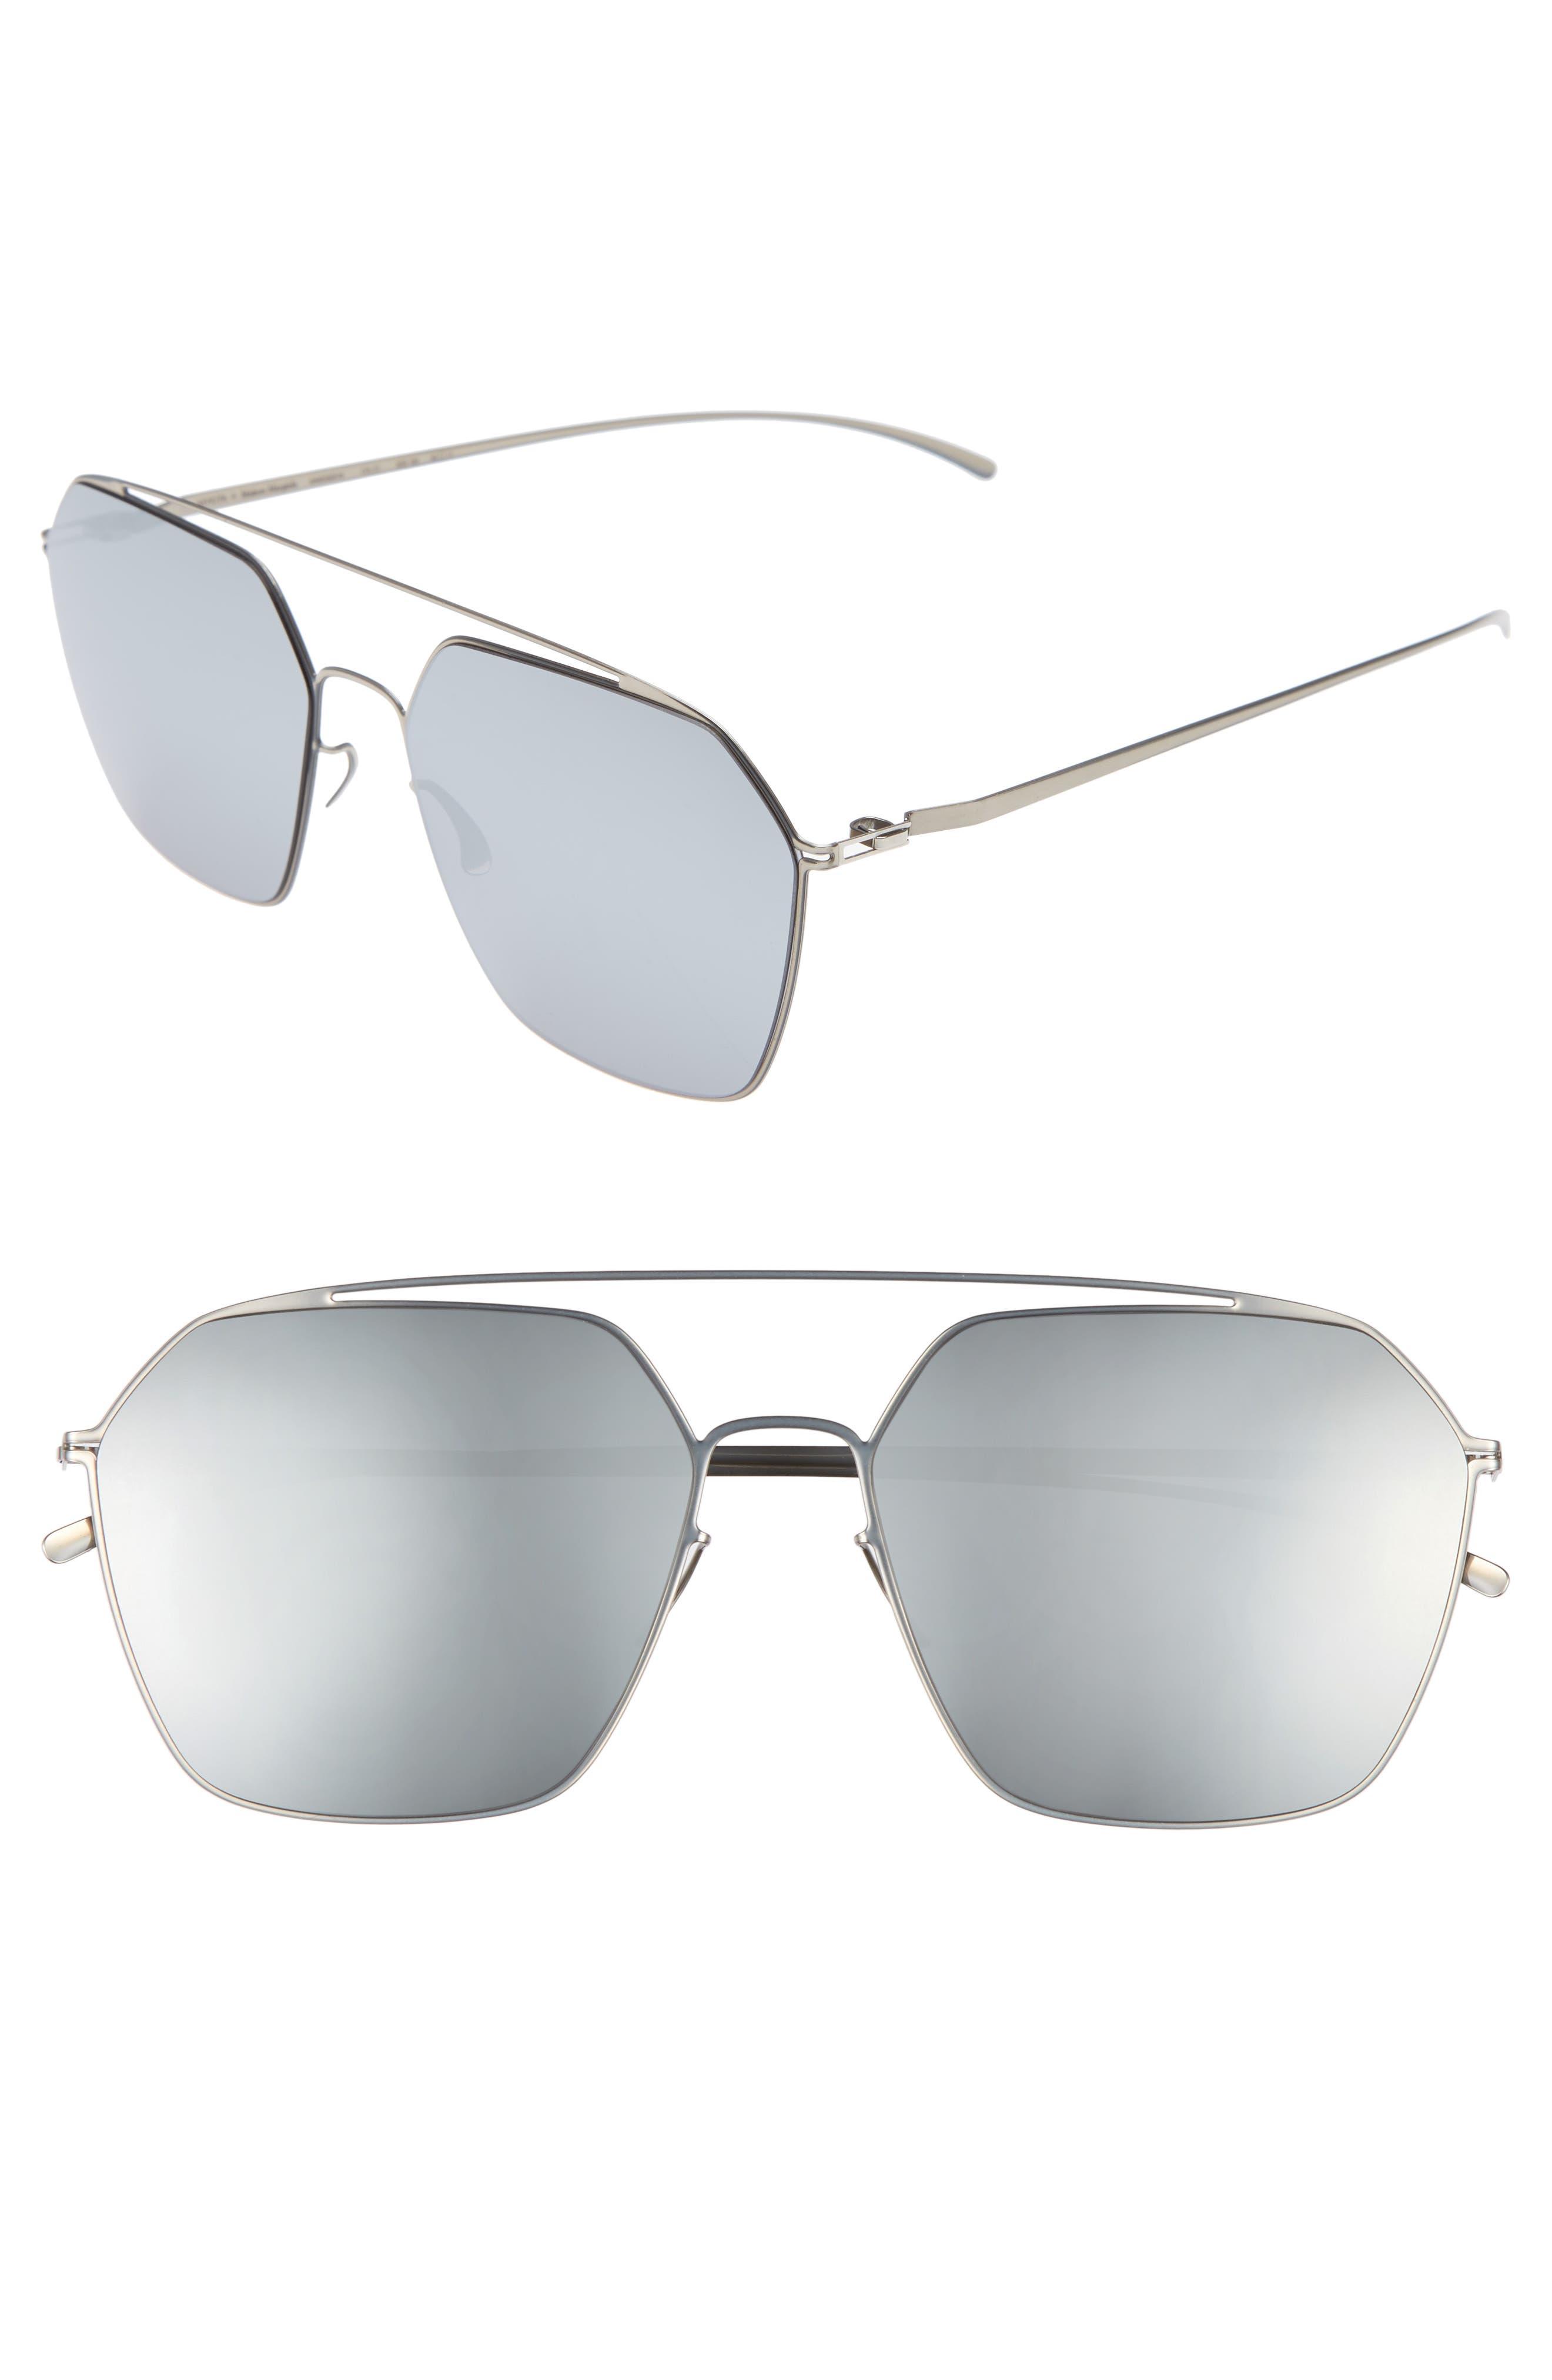 MMESSE016 60mm Sunglasses,                         Main,                         color, Silver